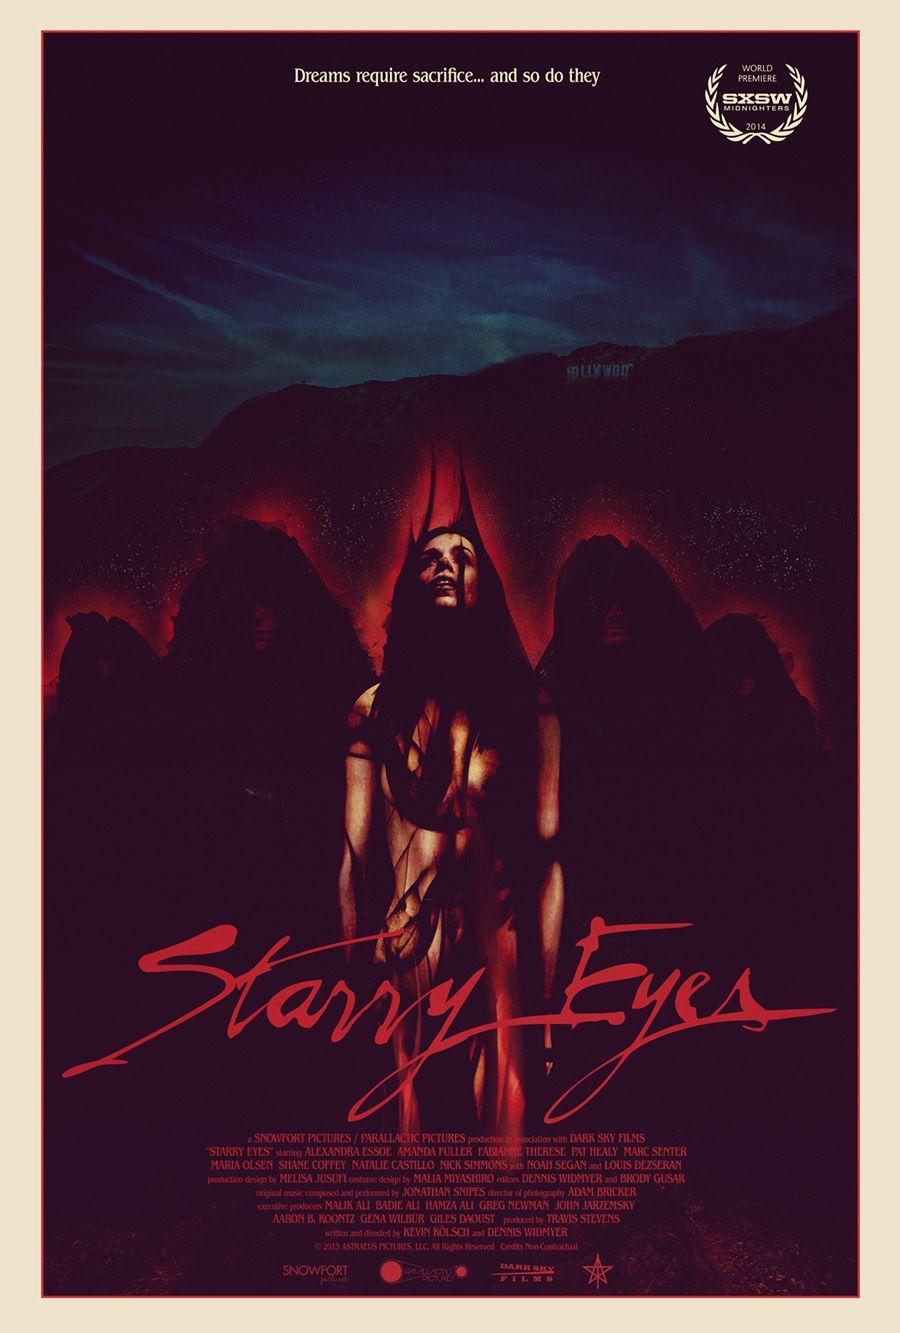 Starry Eyes (Kevin Kolsch, Dennis Widmyer)